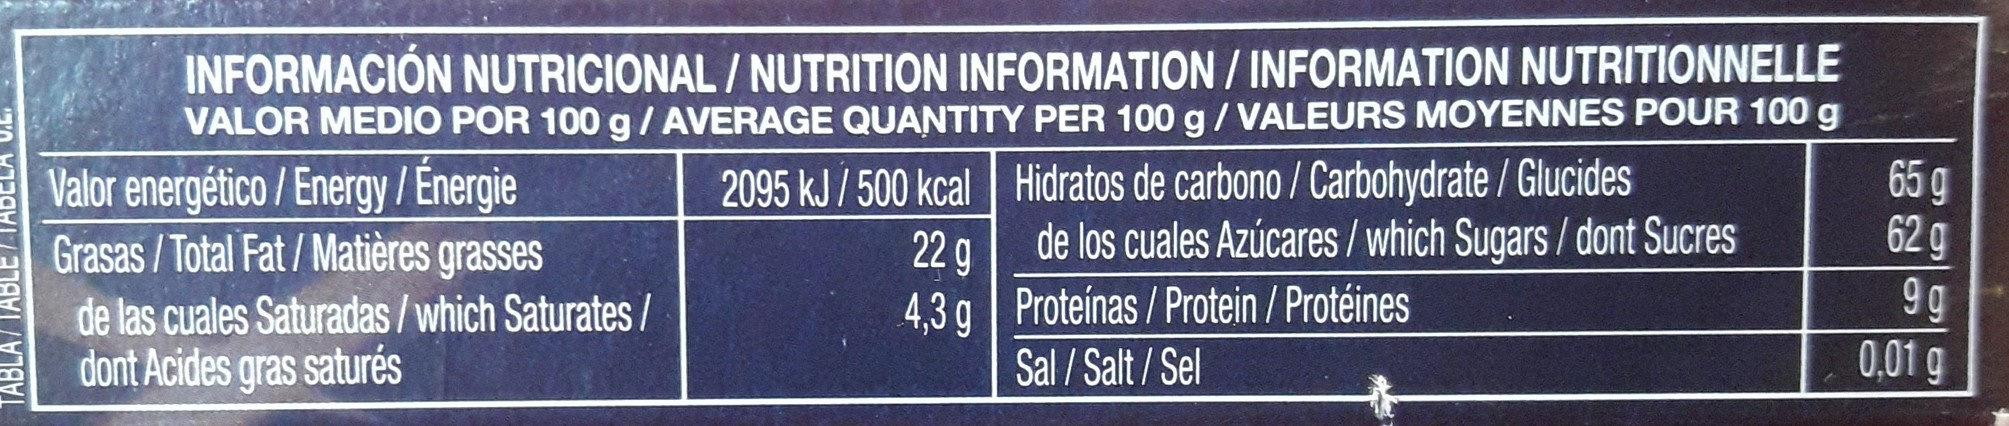 Turron de cacahuete refinado - Nutrition facts